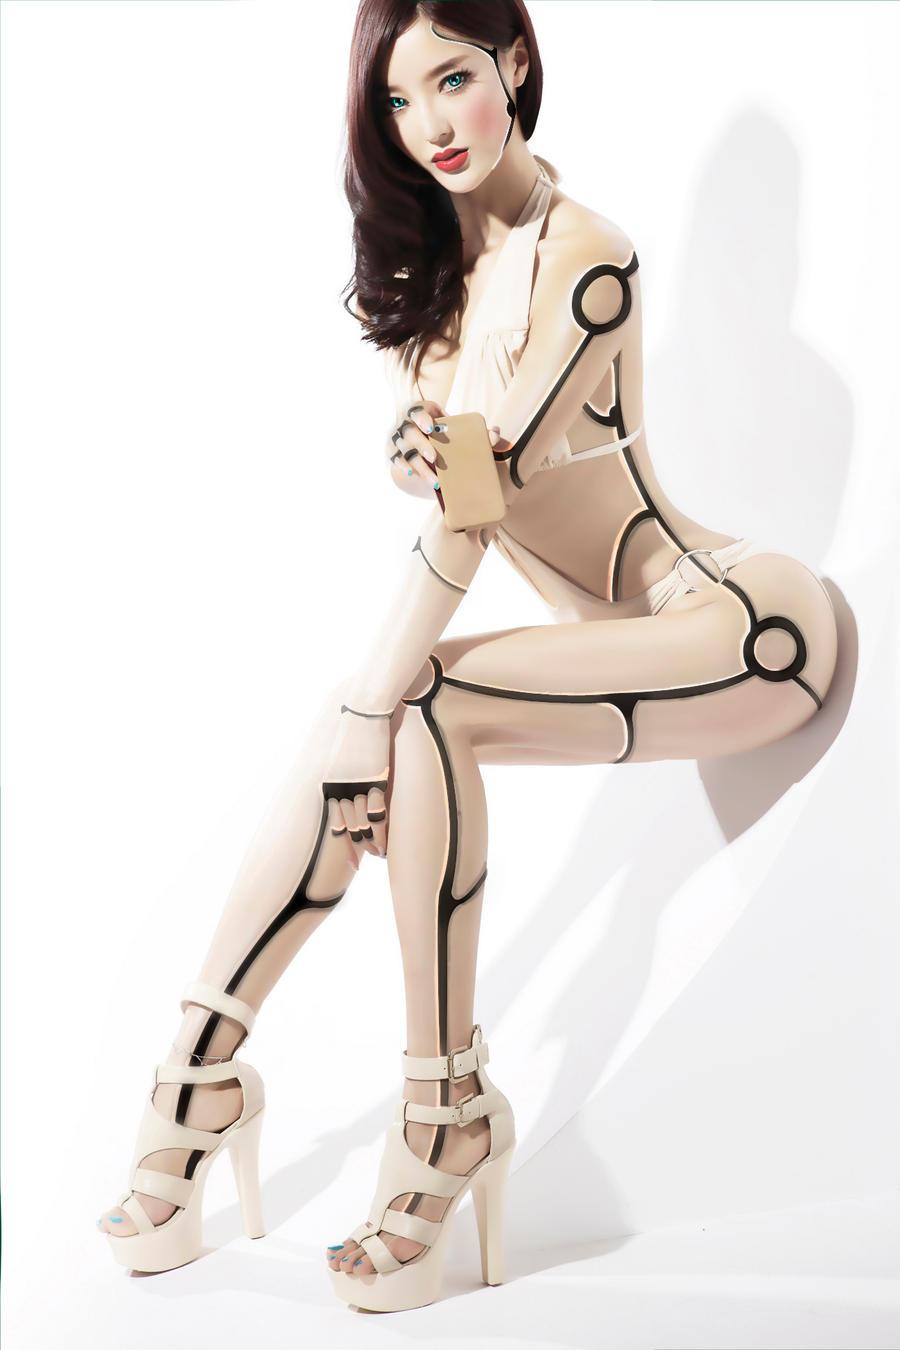 cyborg practice by PHDABC123